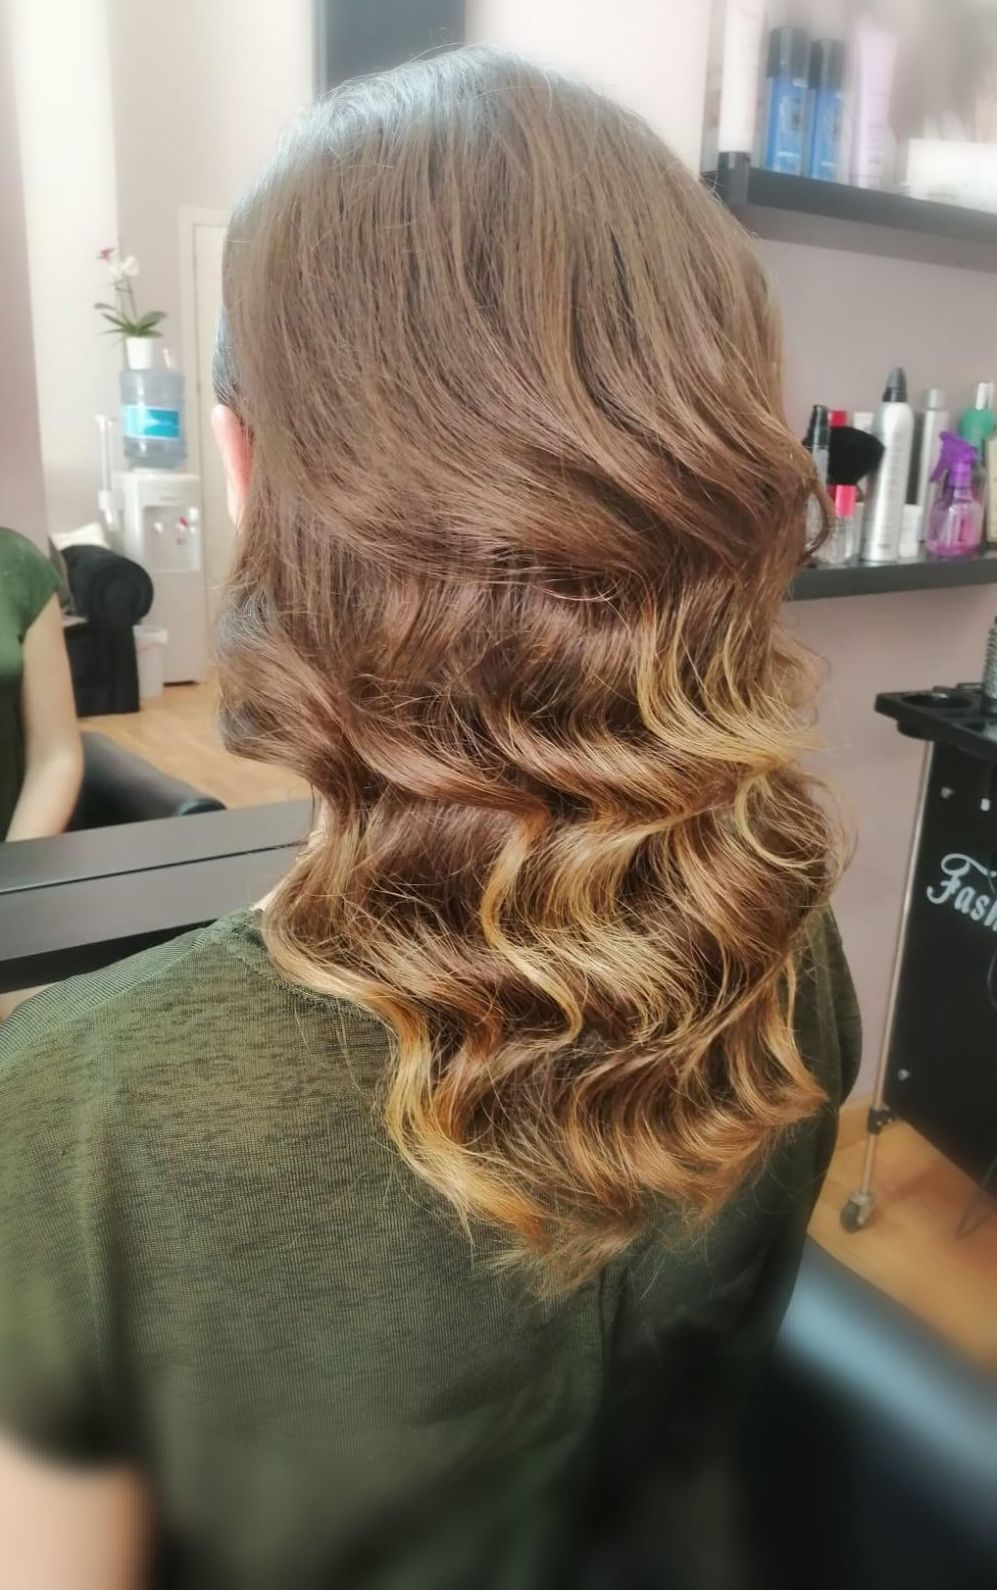 Peinados con ondas. Pregunta a tu estilista en Krystyna Karasenko